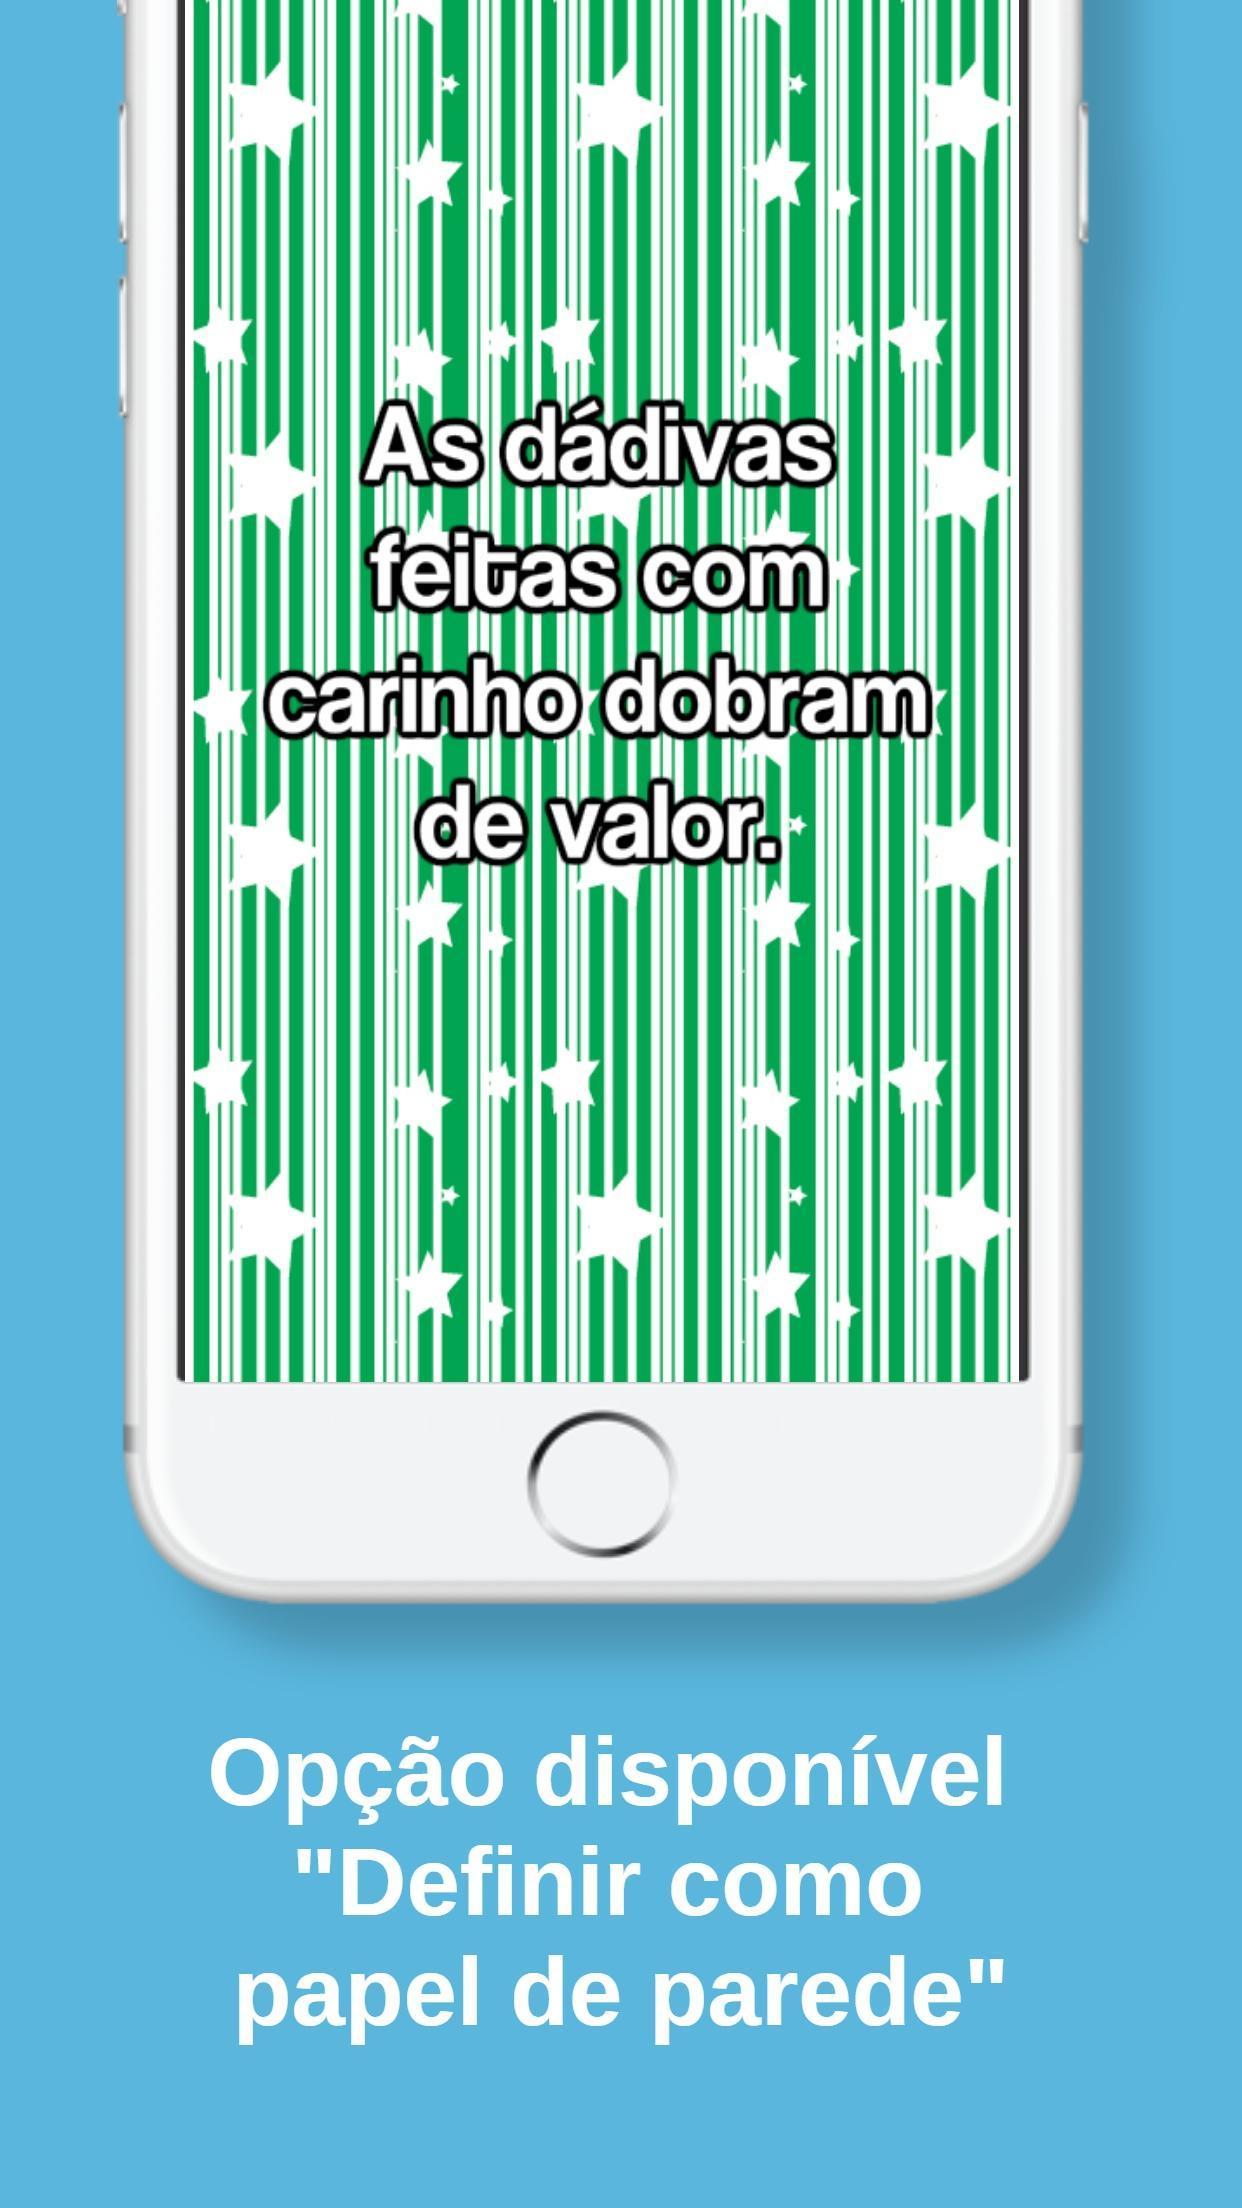 Frases Bonitas Para Fotos For Android Apk Download